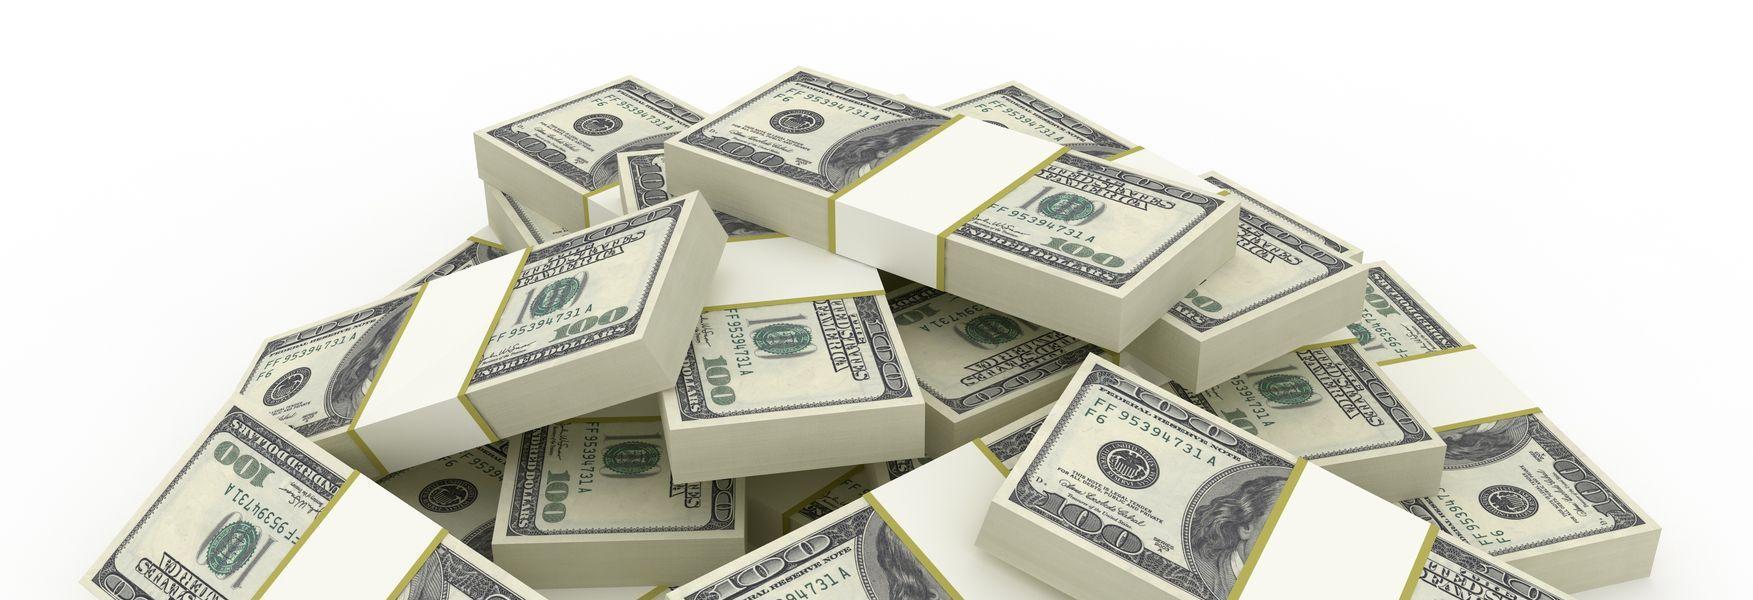 retirement, savings, wealth planner, financial planner